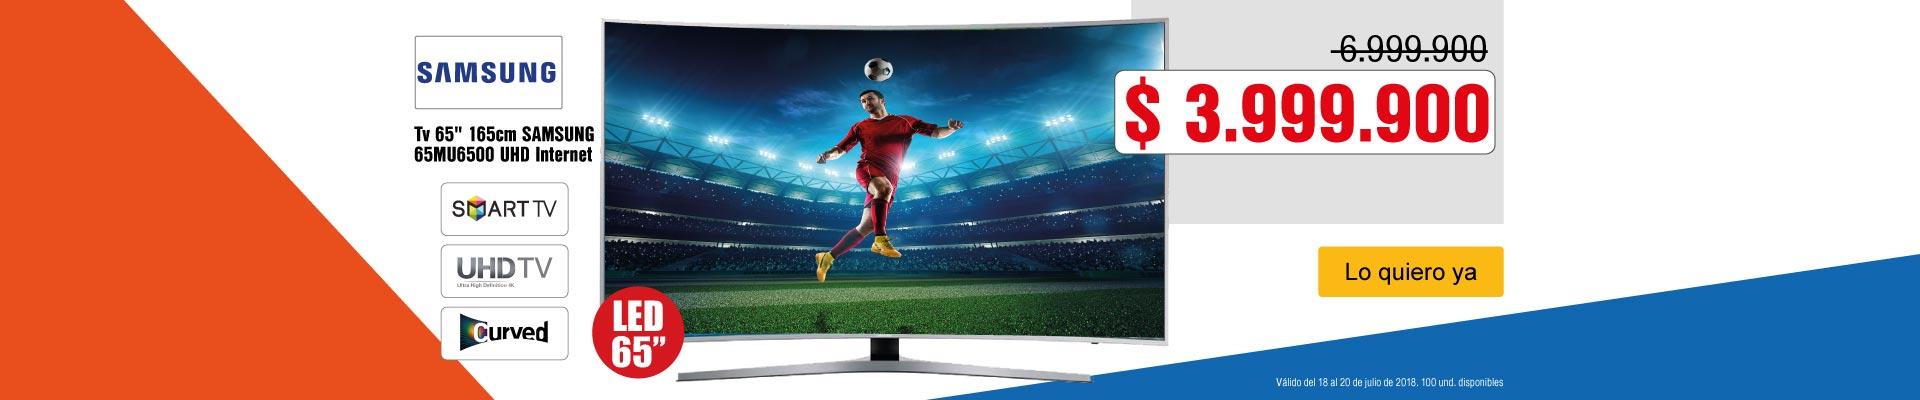 AK-PPAL-5-TV-PP---Samsung-65MU6500-Jul13